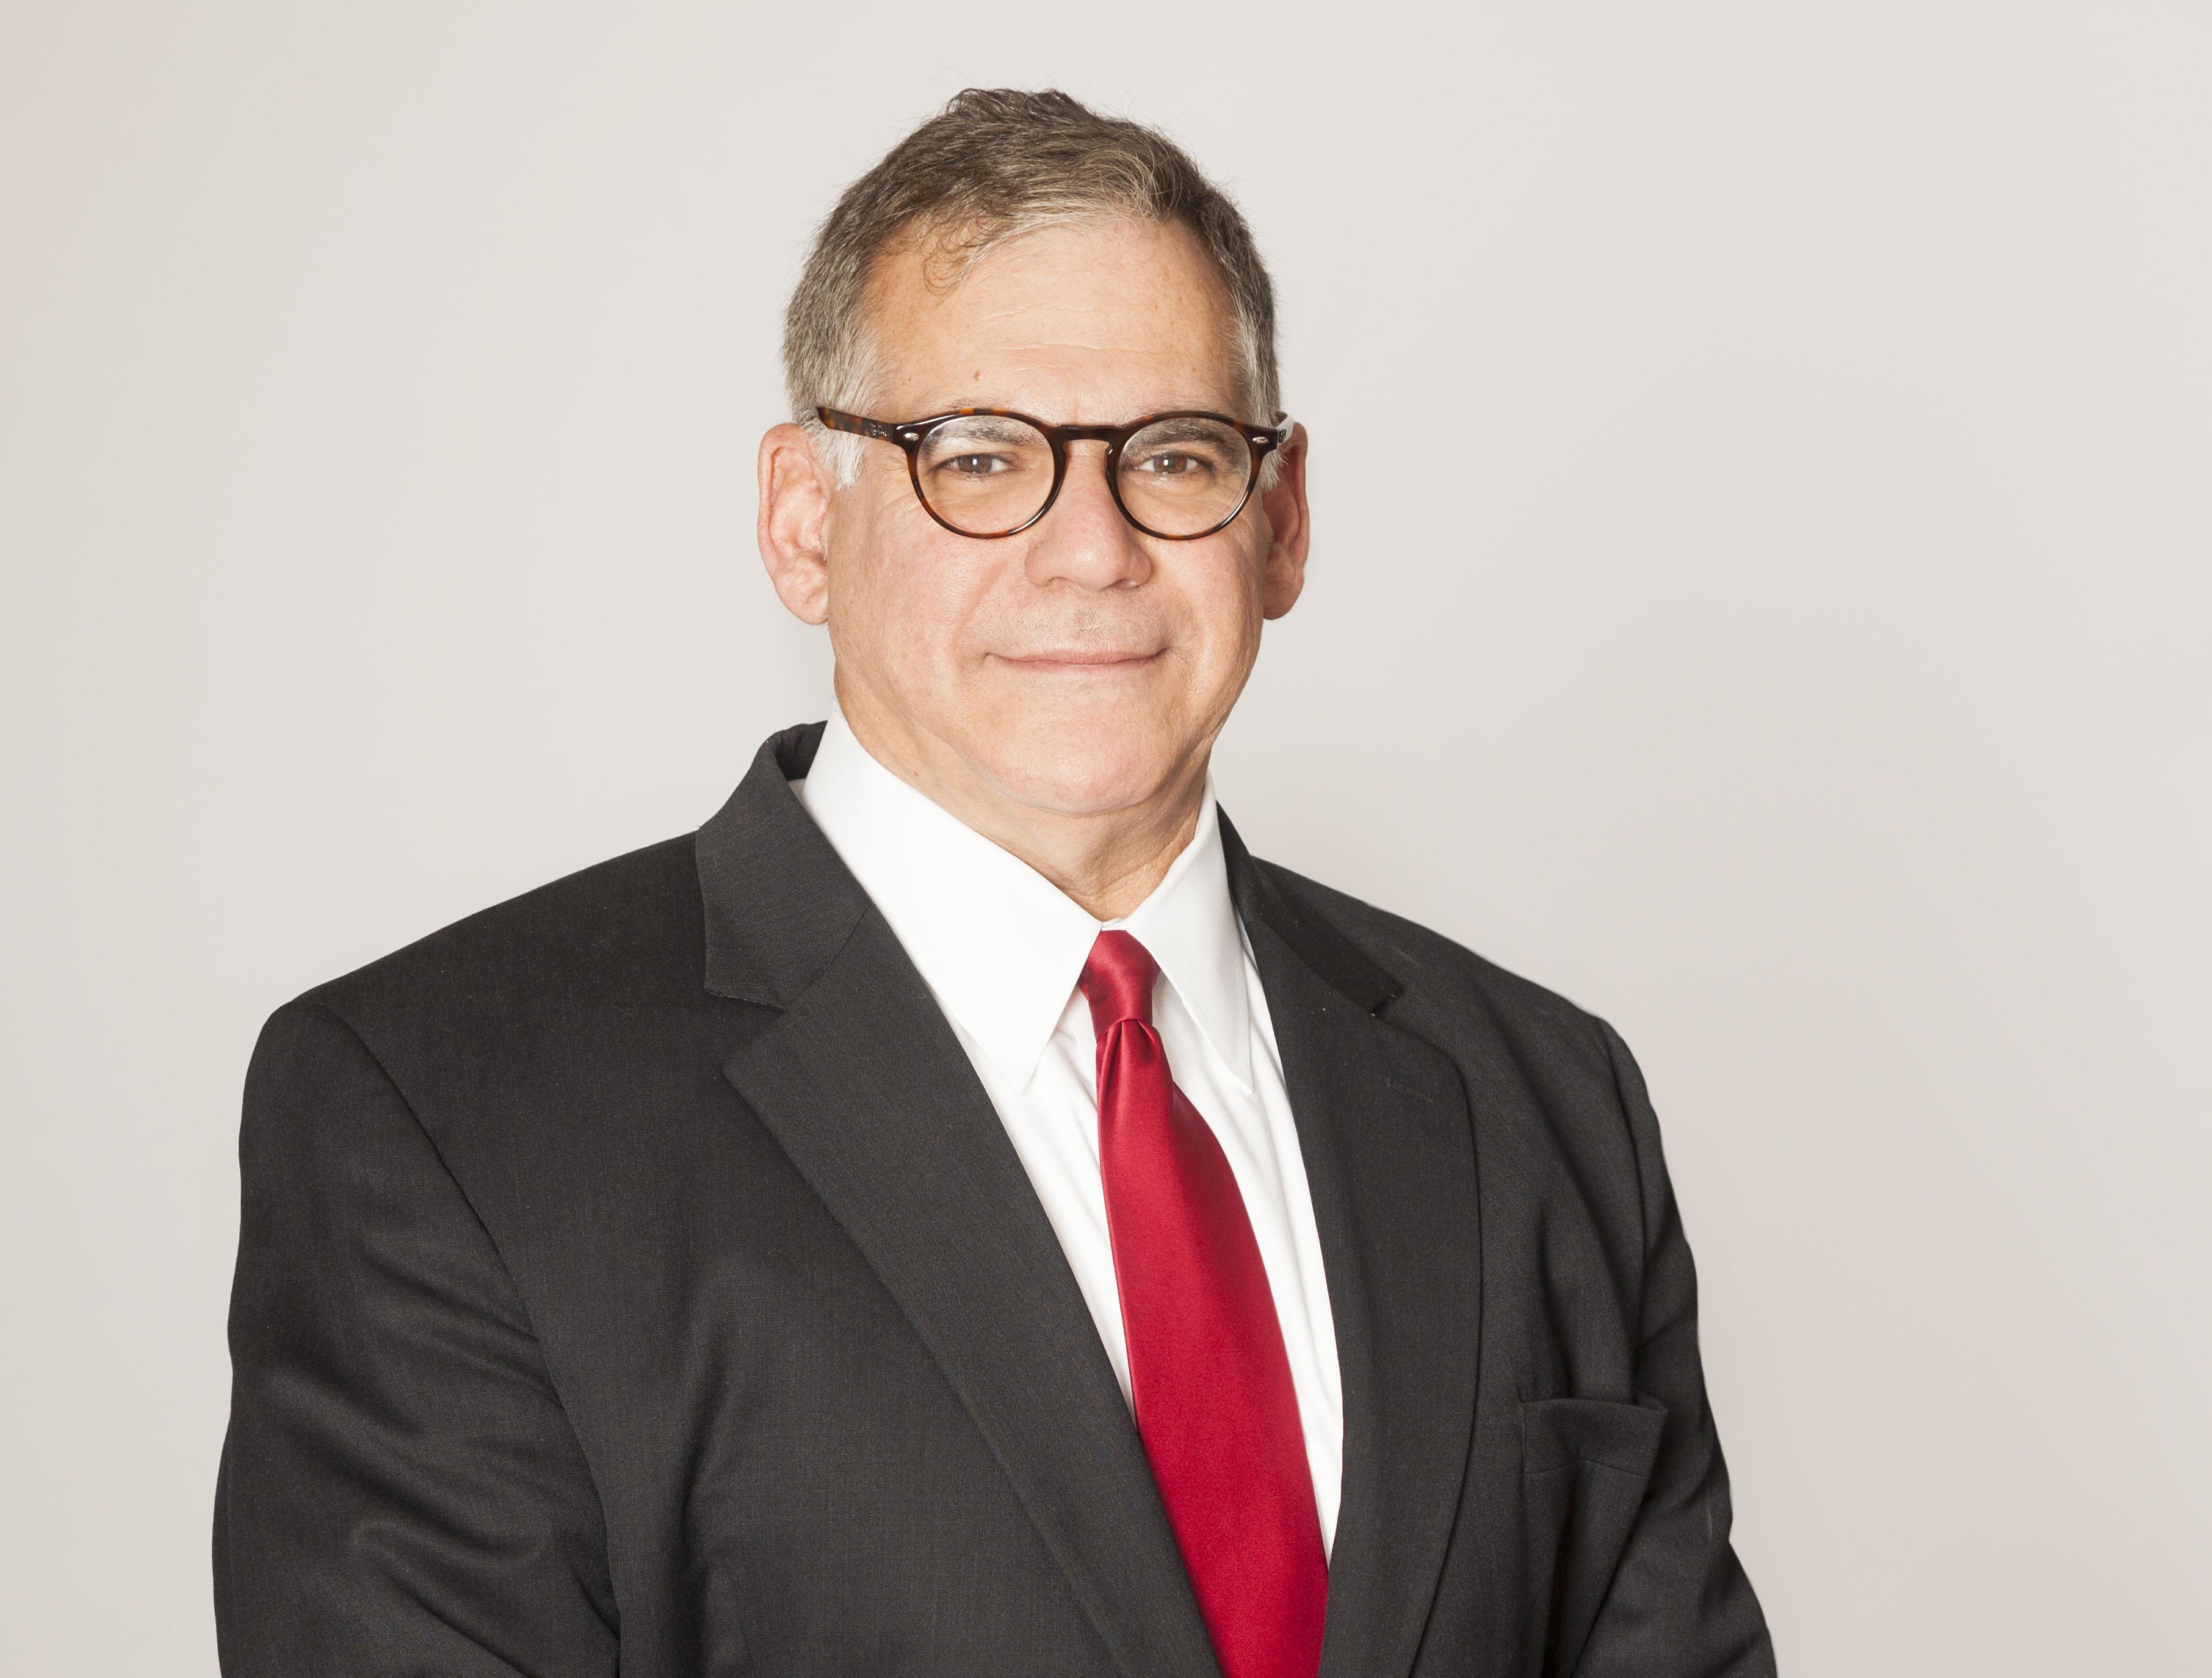 Jim Derminasian